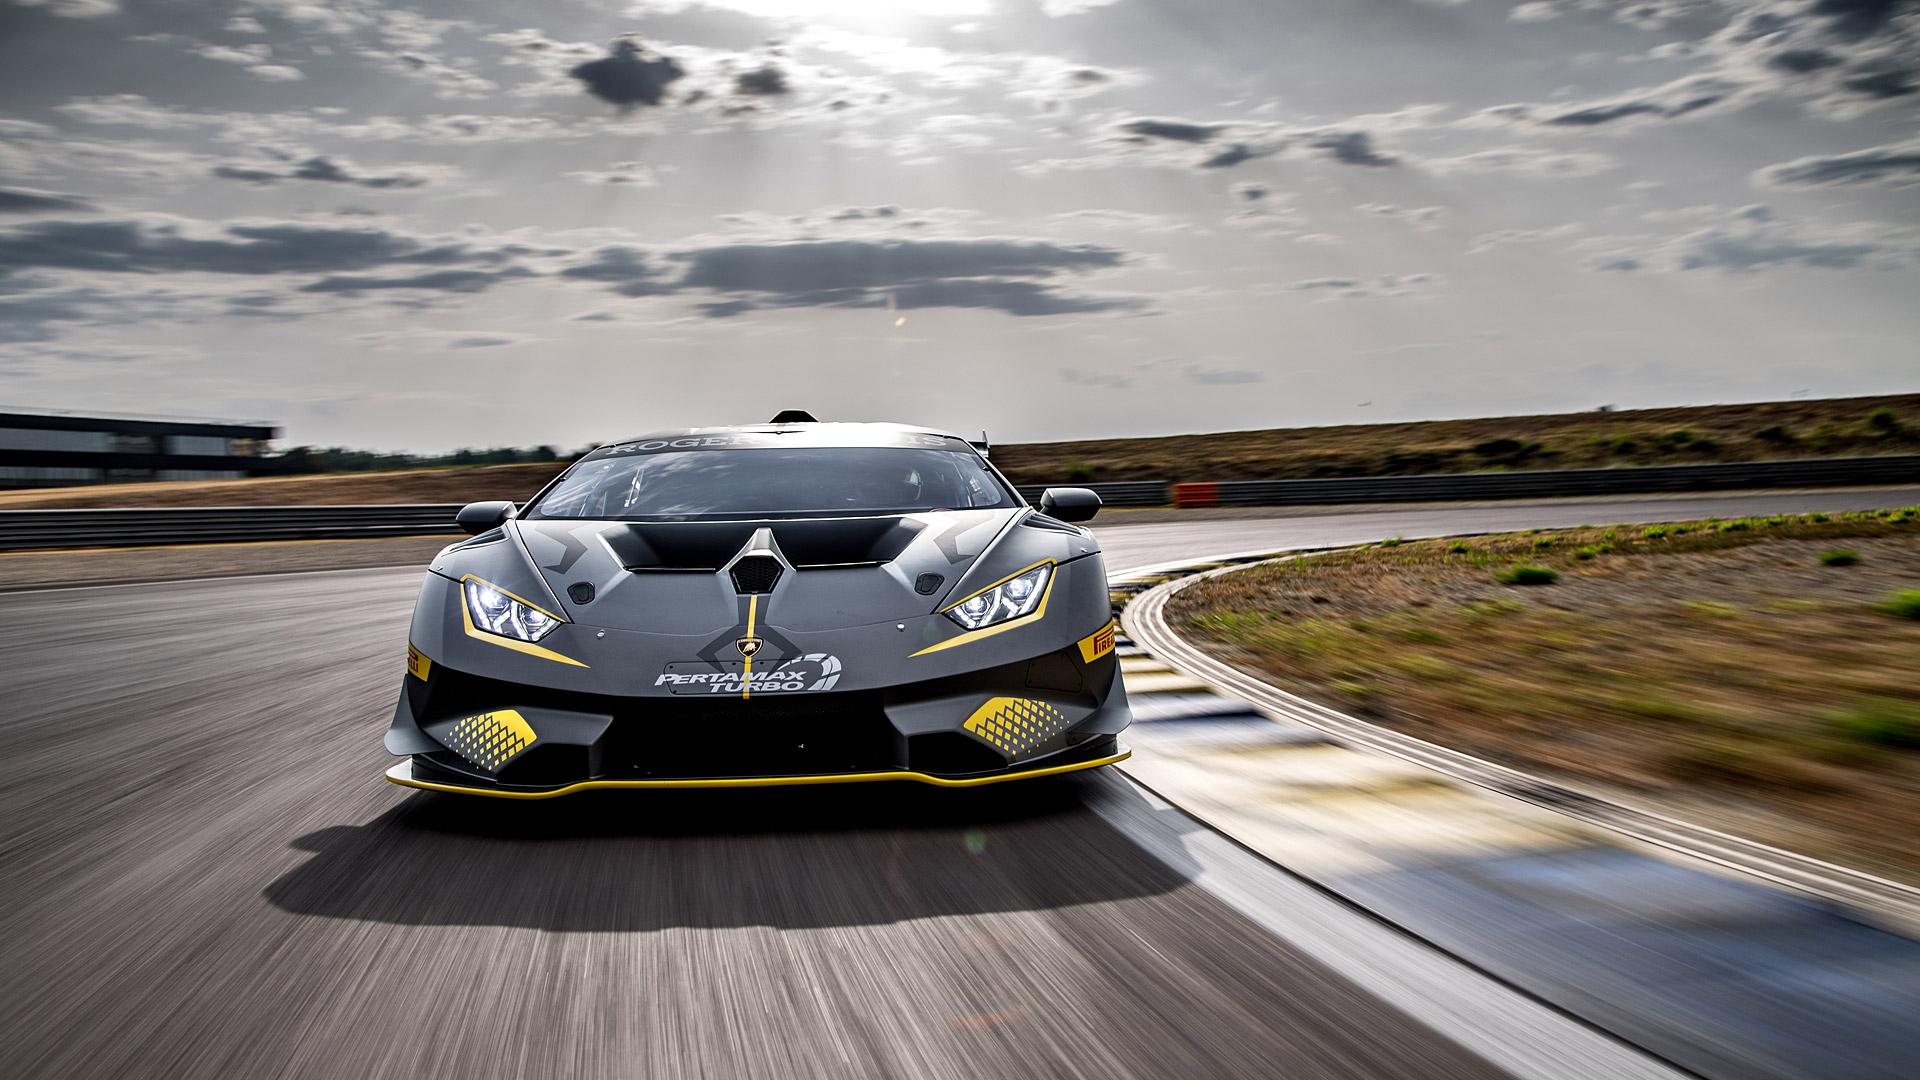 2018 Lamborghini Huracán Super Trofeo EVO Front Wallpapers (3)